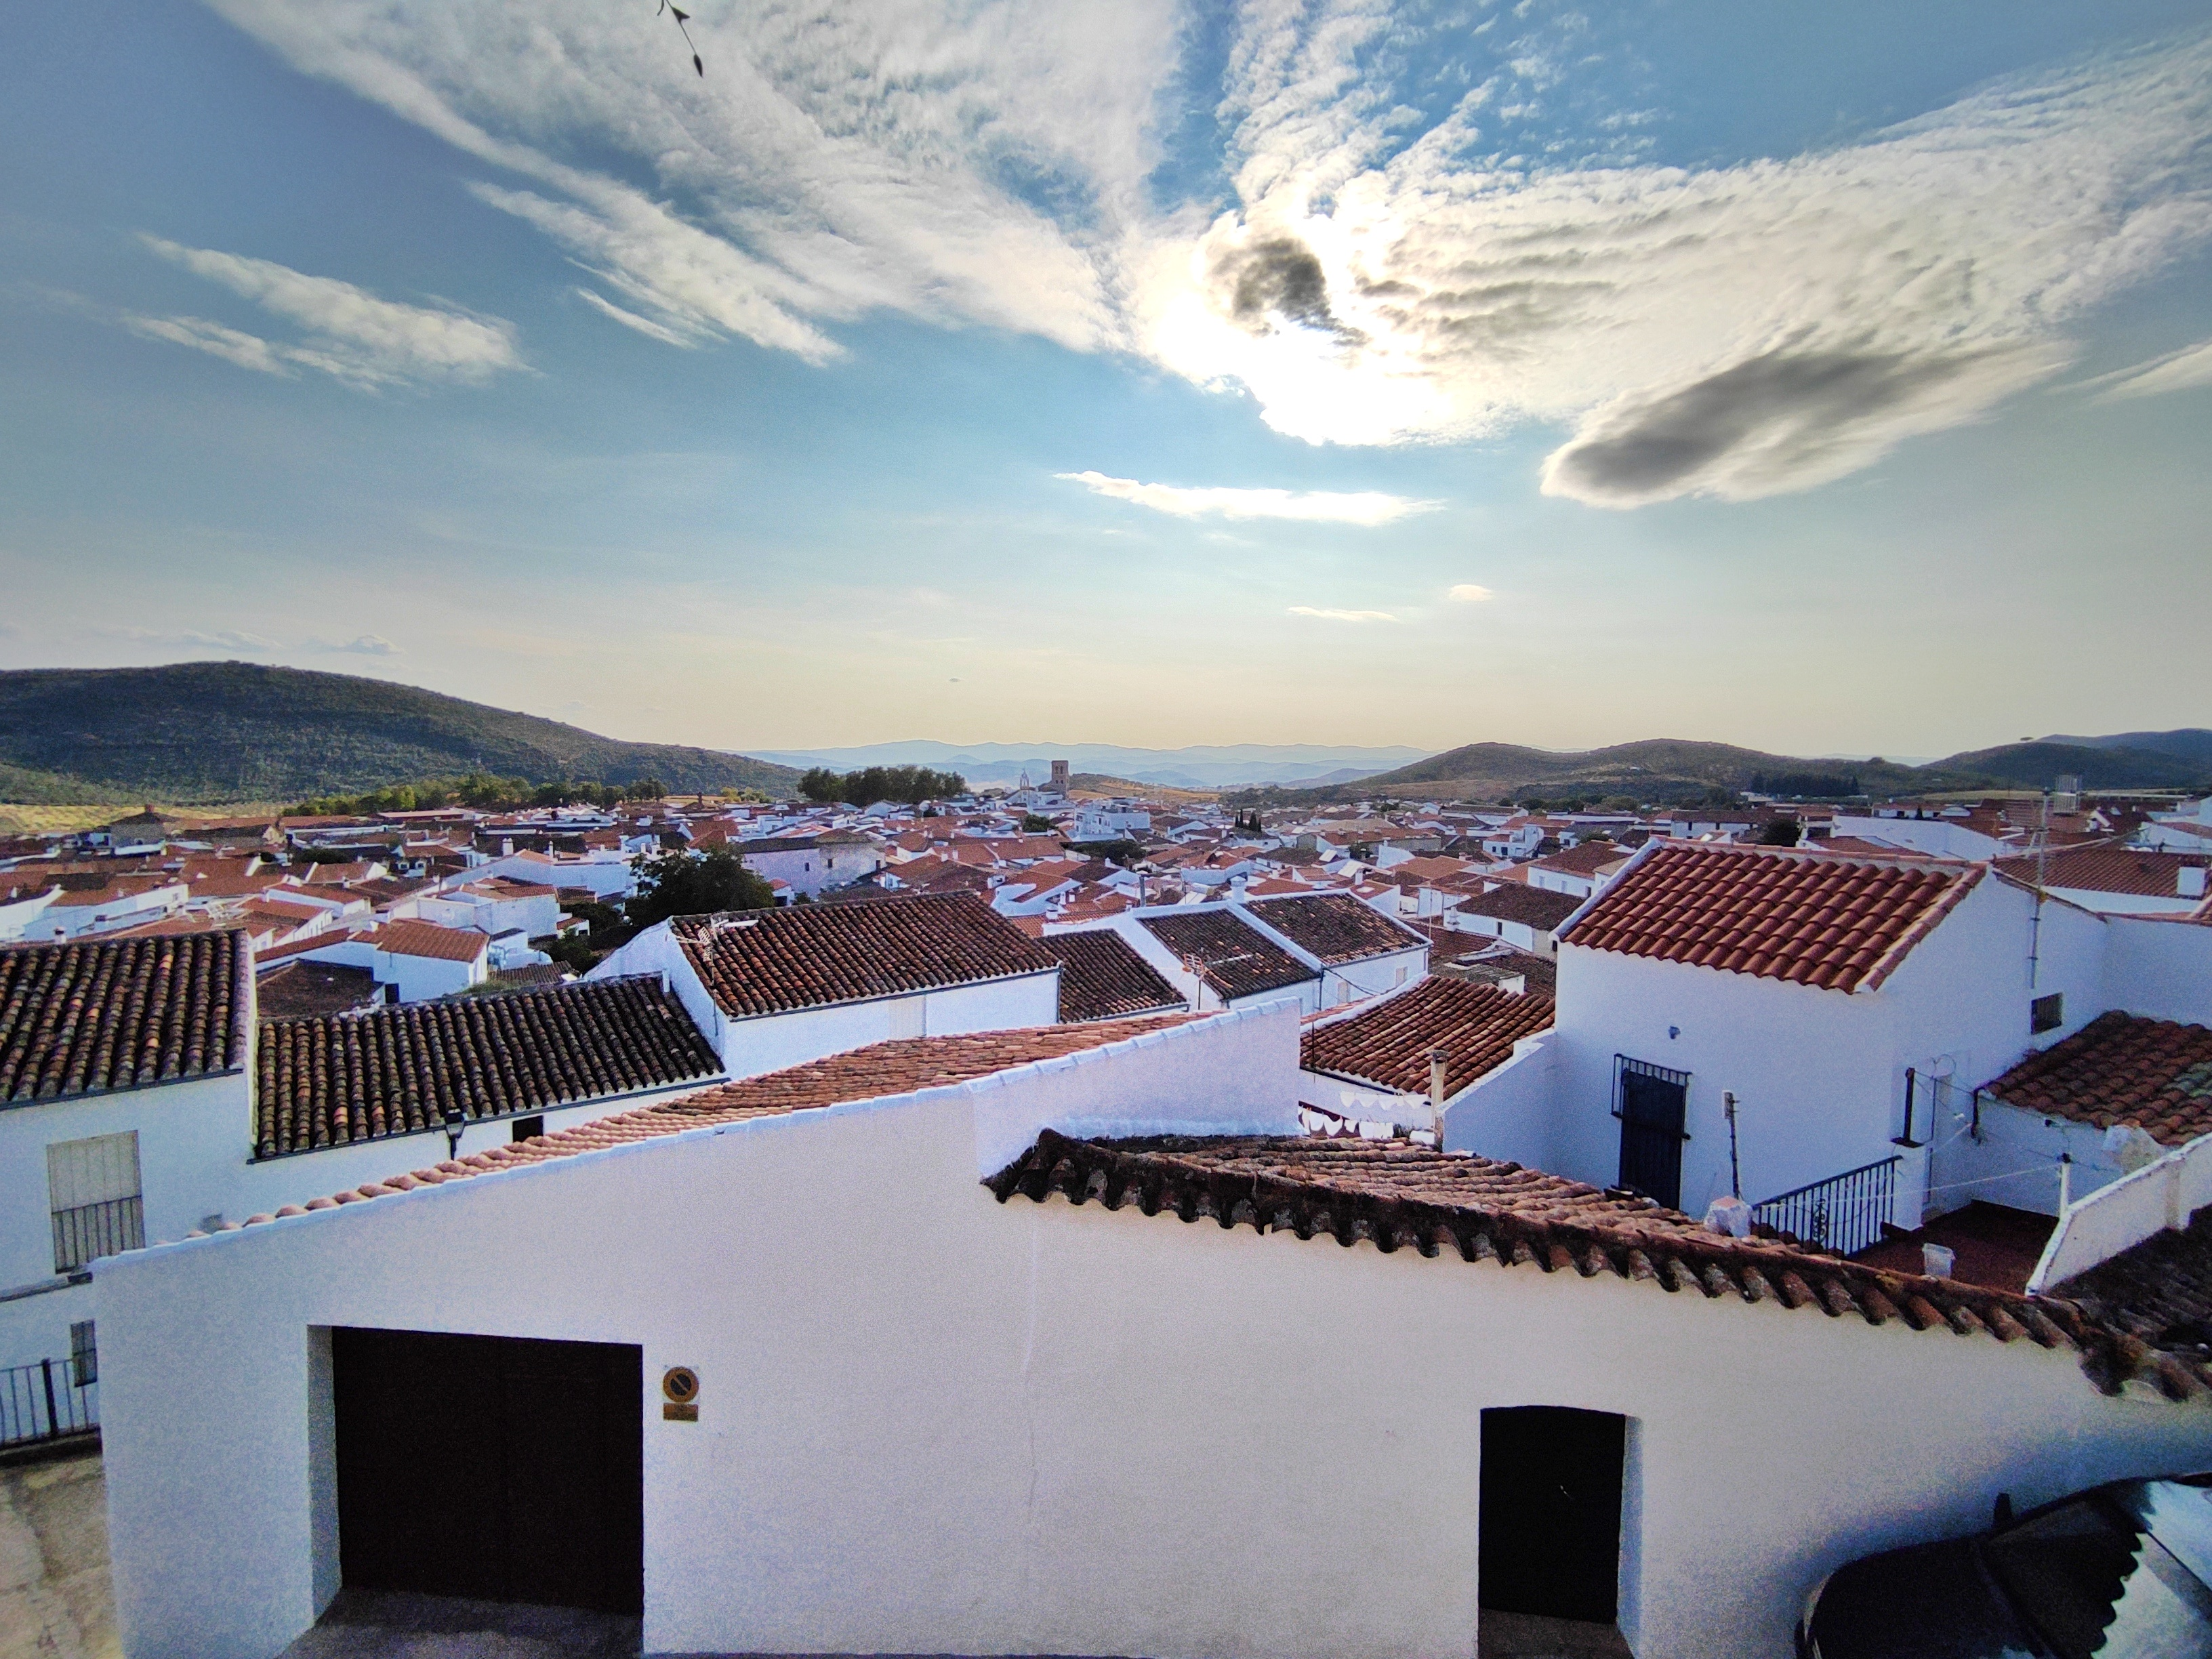 https://multimedia.andalucia.org/media/30C5694873514DF5BFE17164EAF1B940/img/3556454EF0C848EE9966EE5715C2F4C2/Guadalcanal_Sevilla_Andalucia_insolita.jpeg?responsive